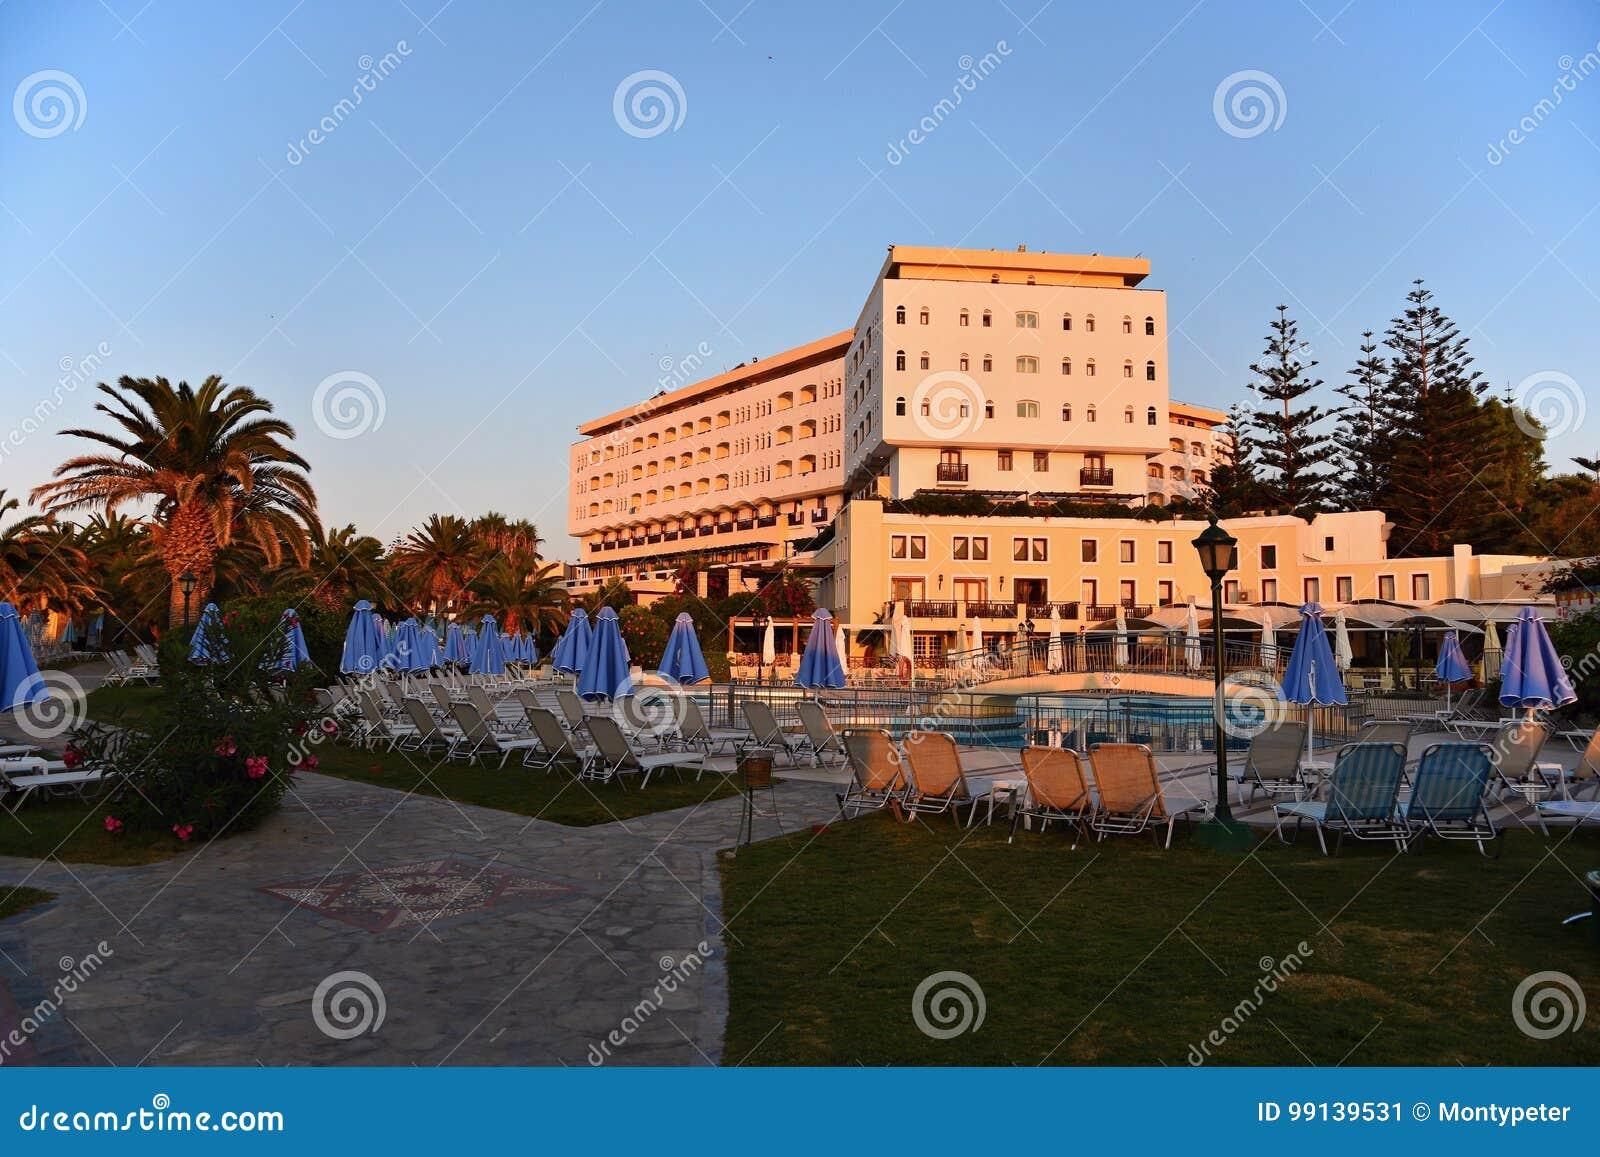 Schones Hotel Strandurlaubsort Bei Sonnenuntergang